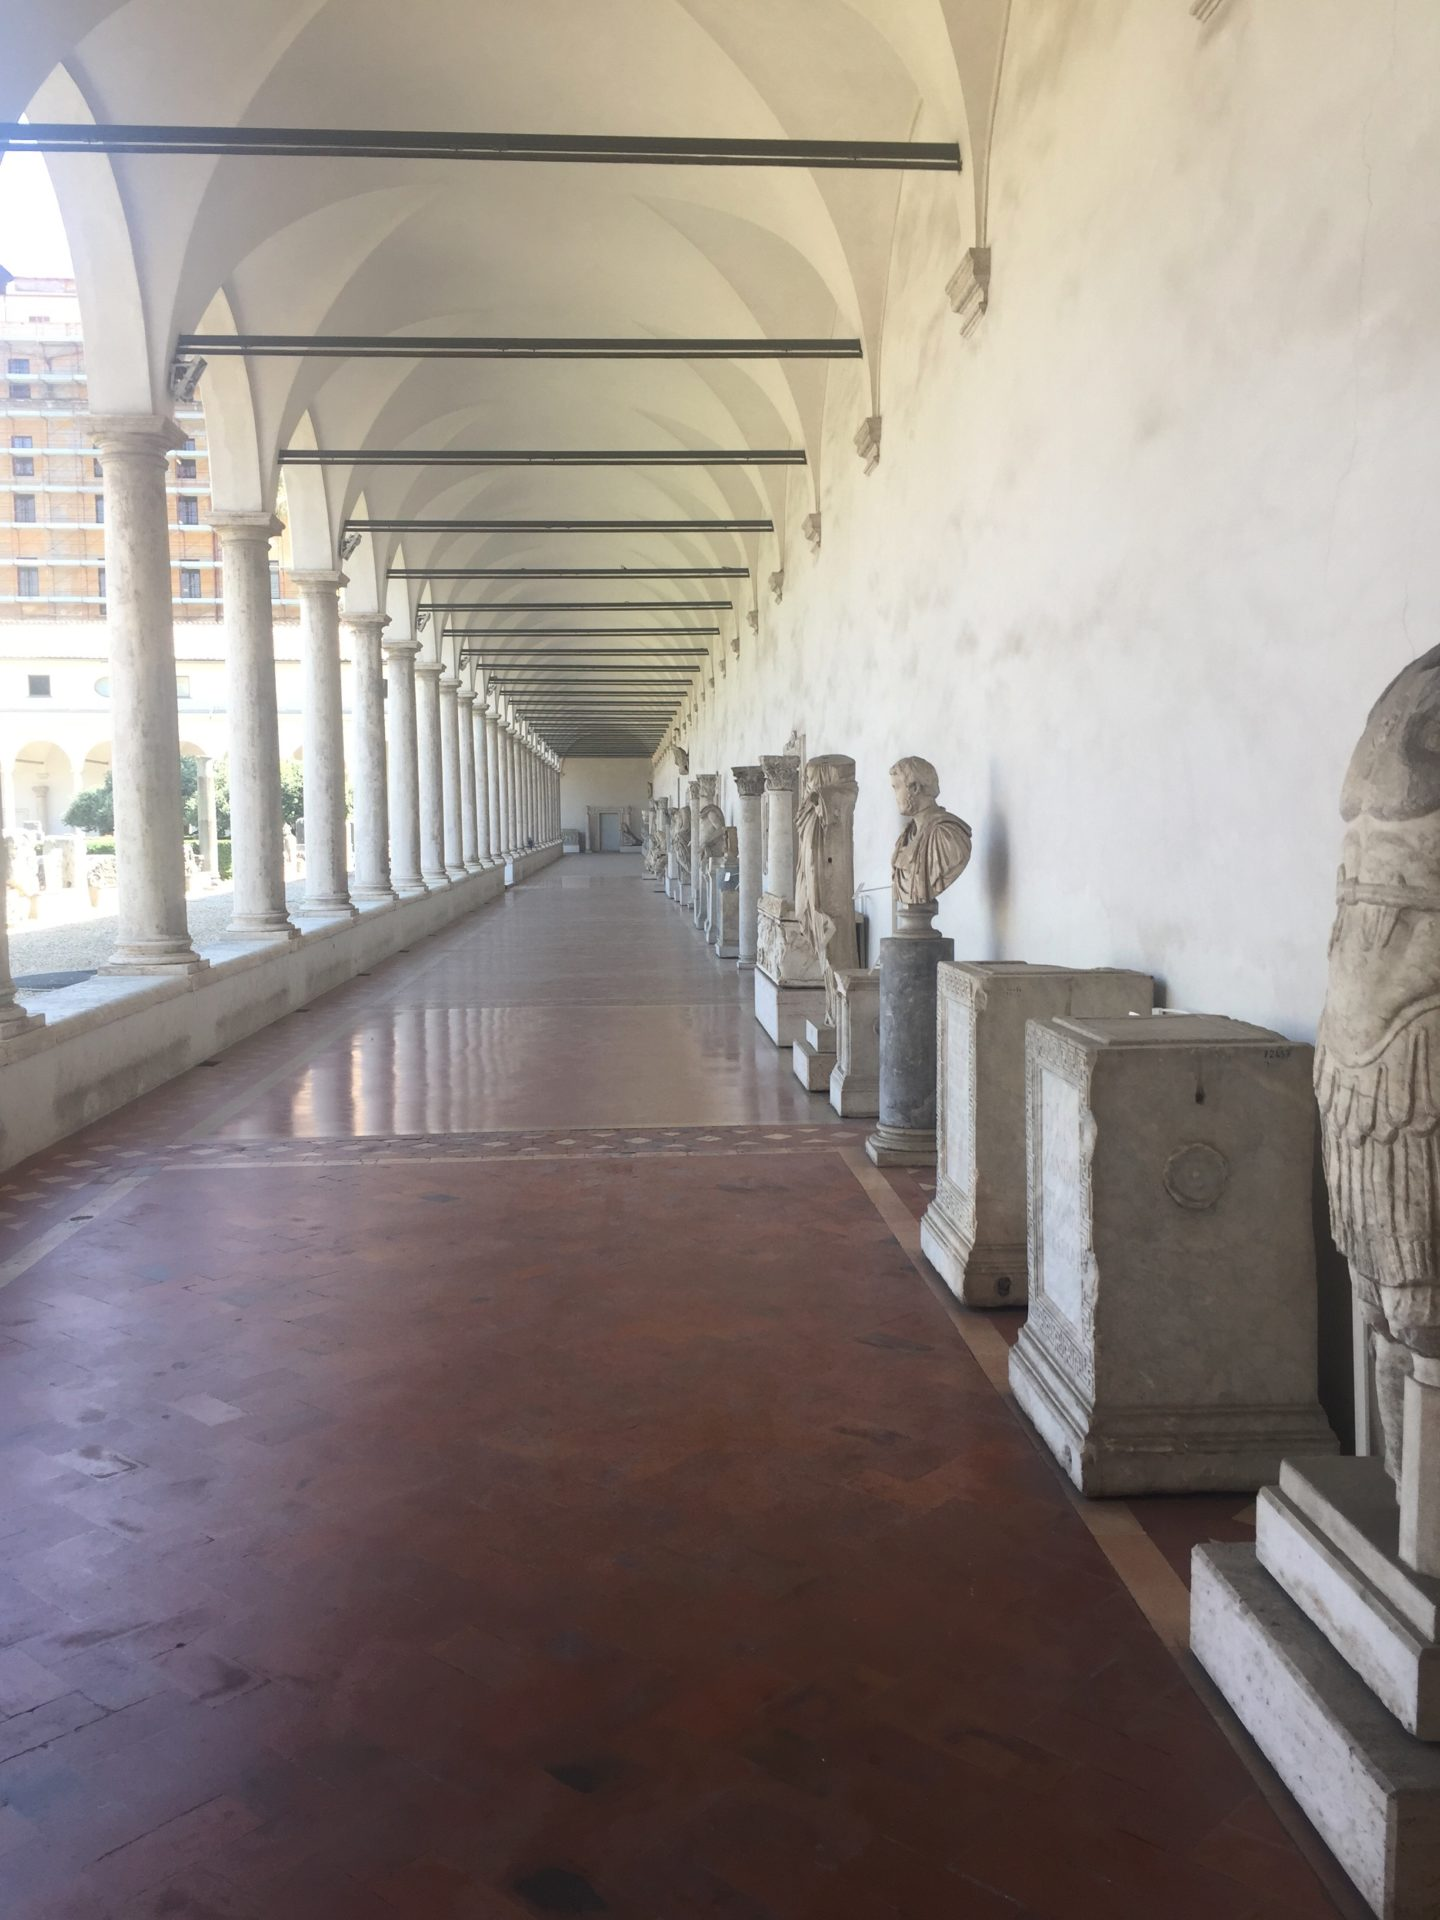 "<img src=""http://marenostrum.pl/wp-content/uploads//2019/11/krużganki-klasztoru-Kartuzów-w-termach-Dioklecjana.jpeg"" alt=""krużganki museo nazionale romano"" />"